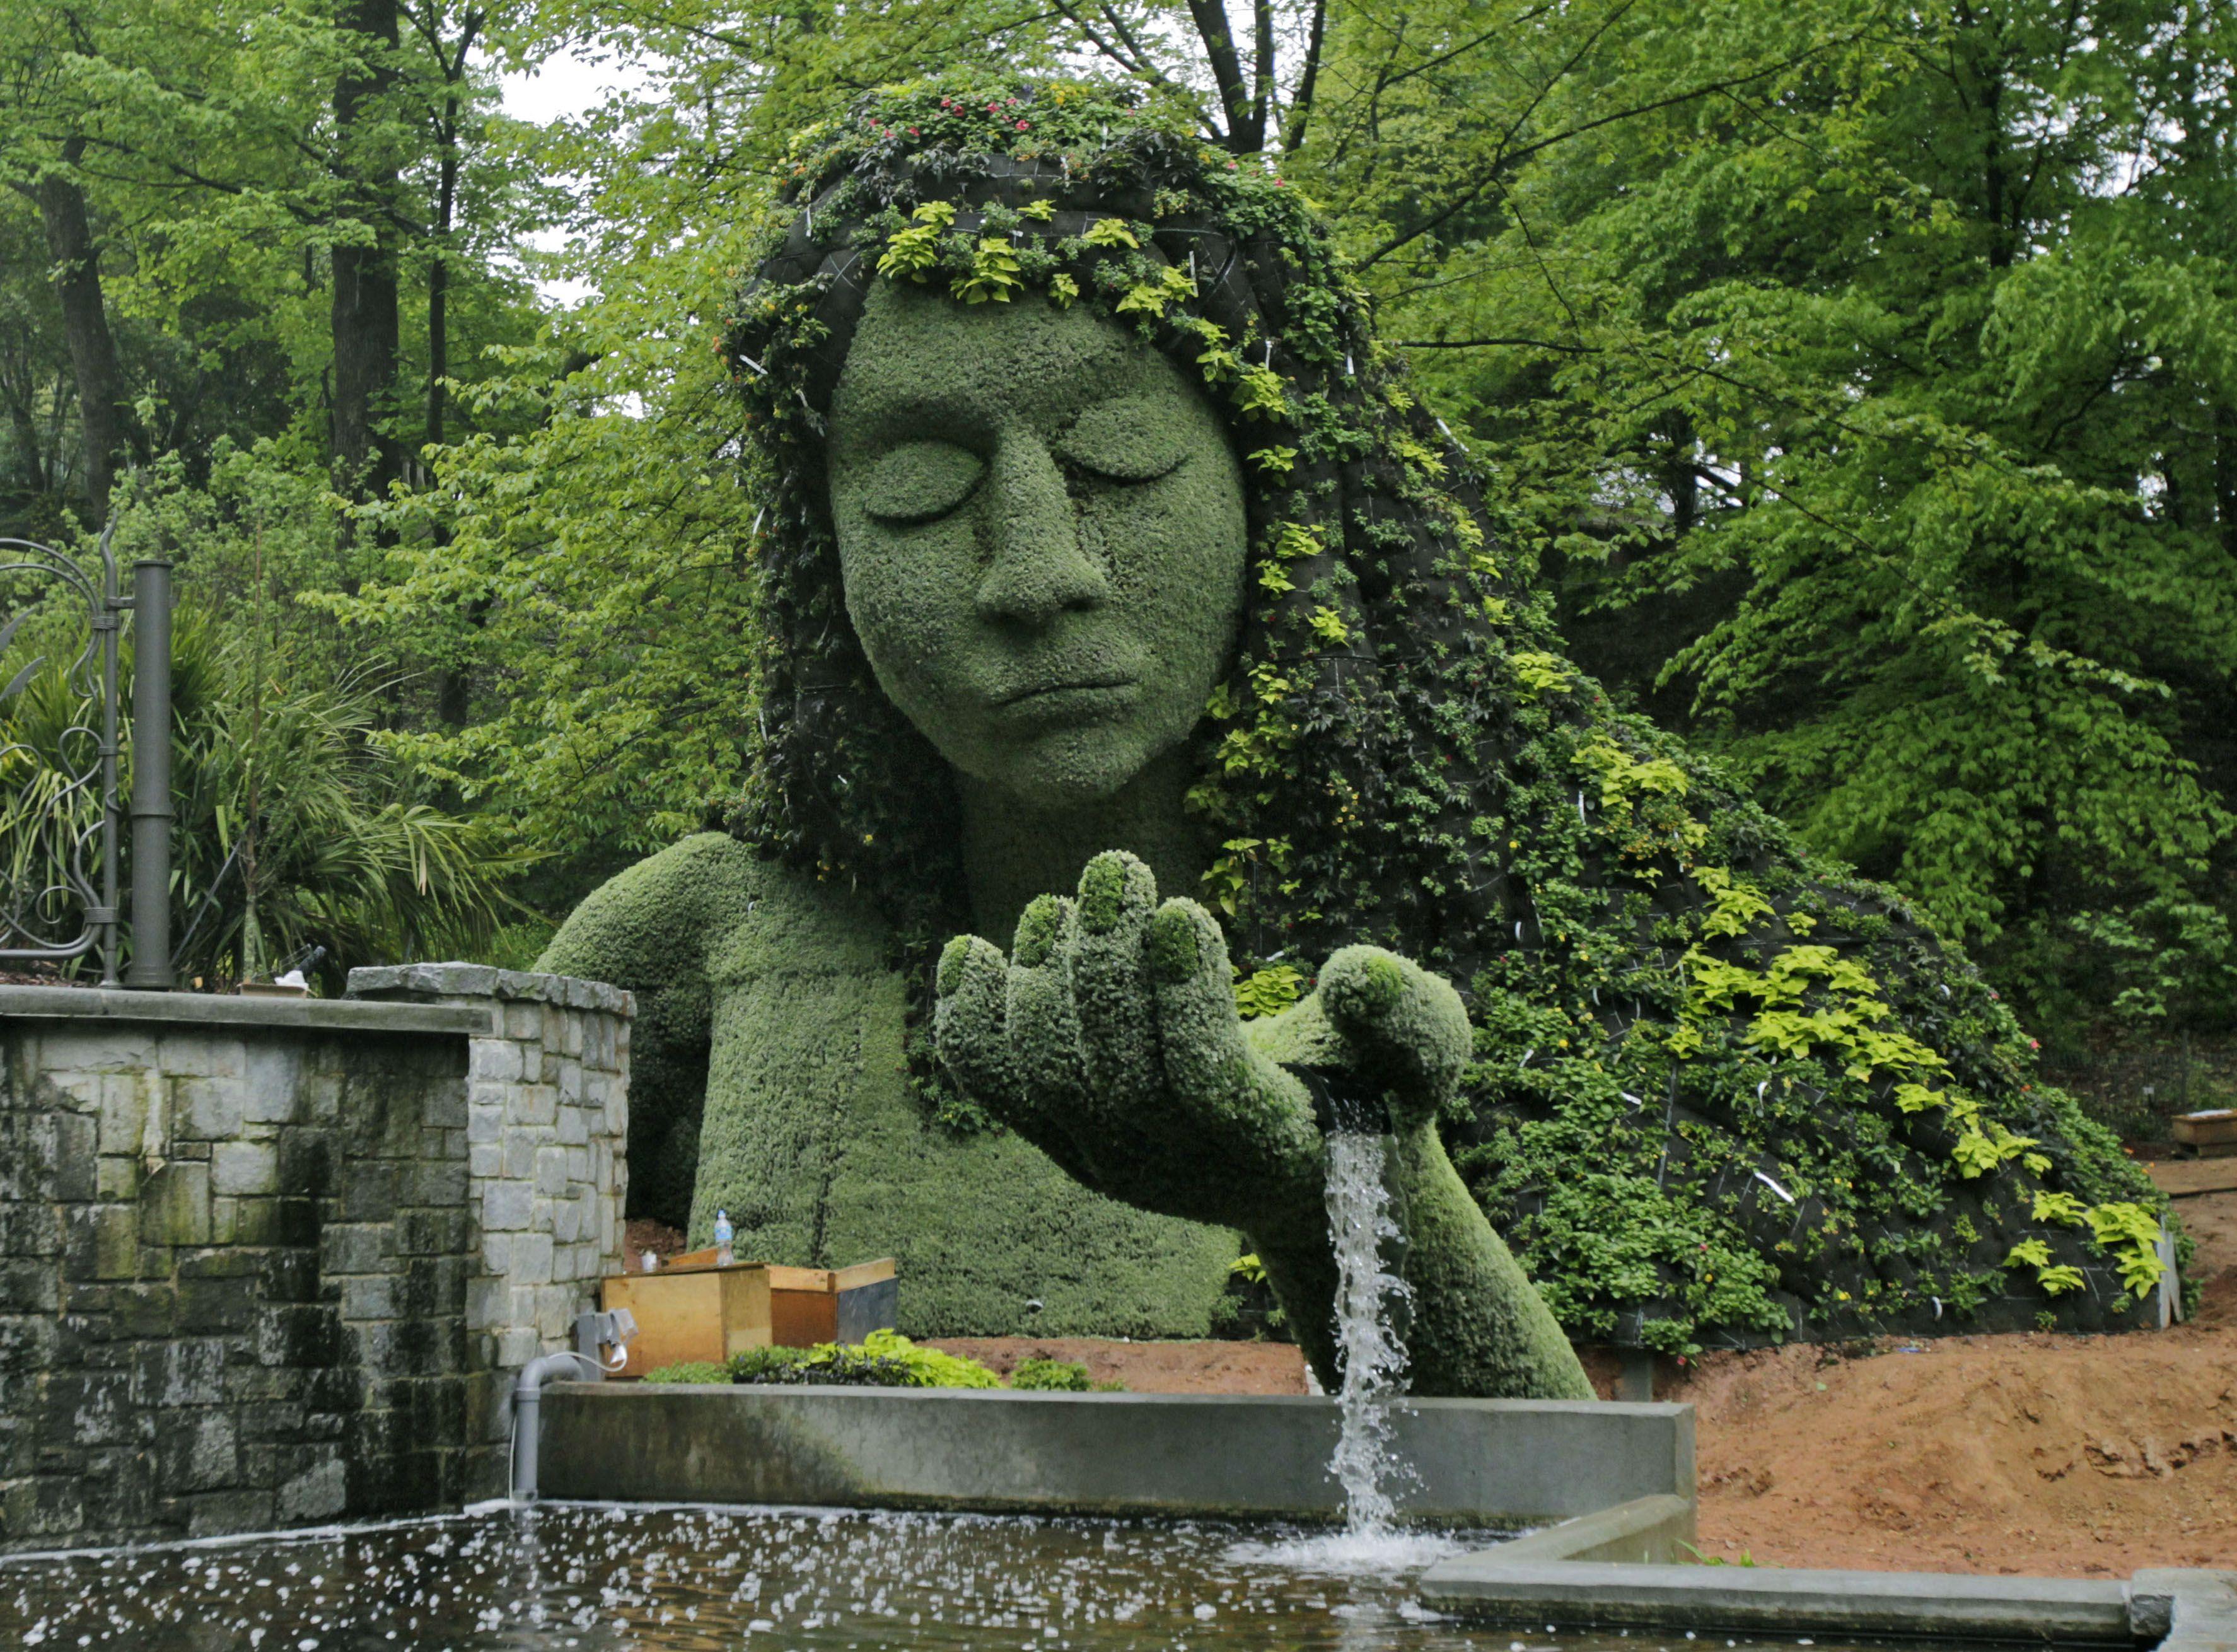 U201cImaginary Worlds: Plants Larger Than Lifeu201d Comes To The Atlanta Botanical  Garden May